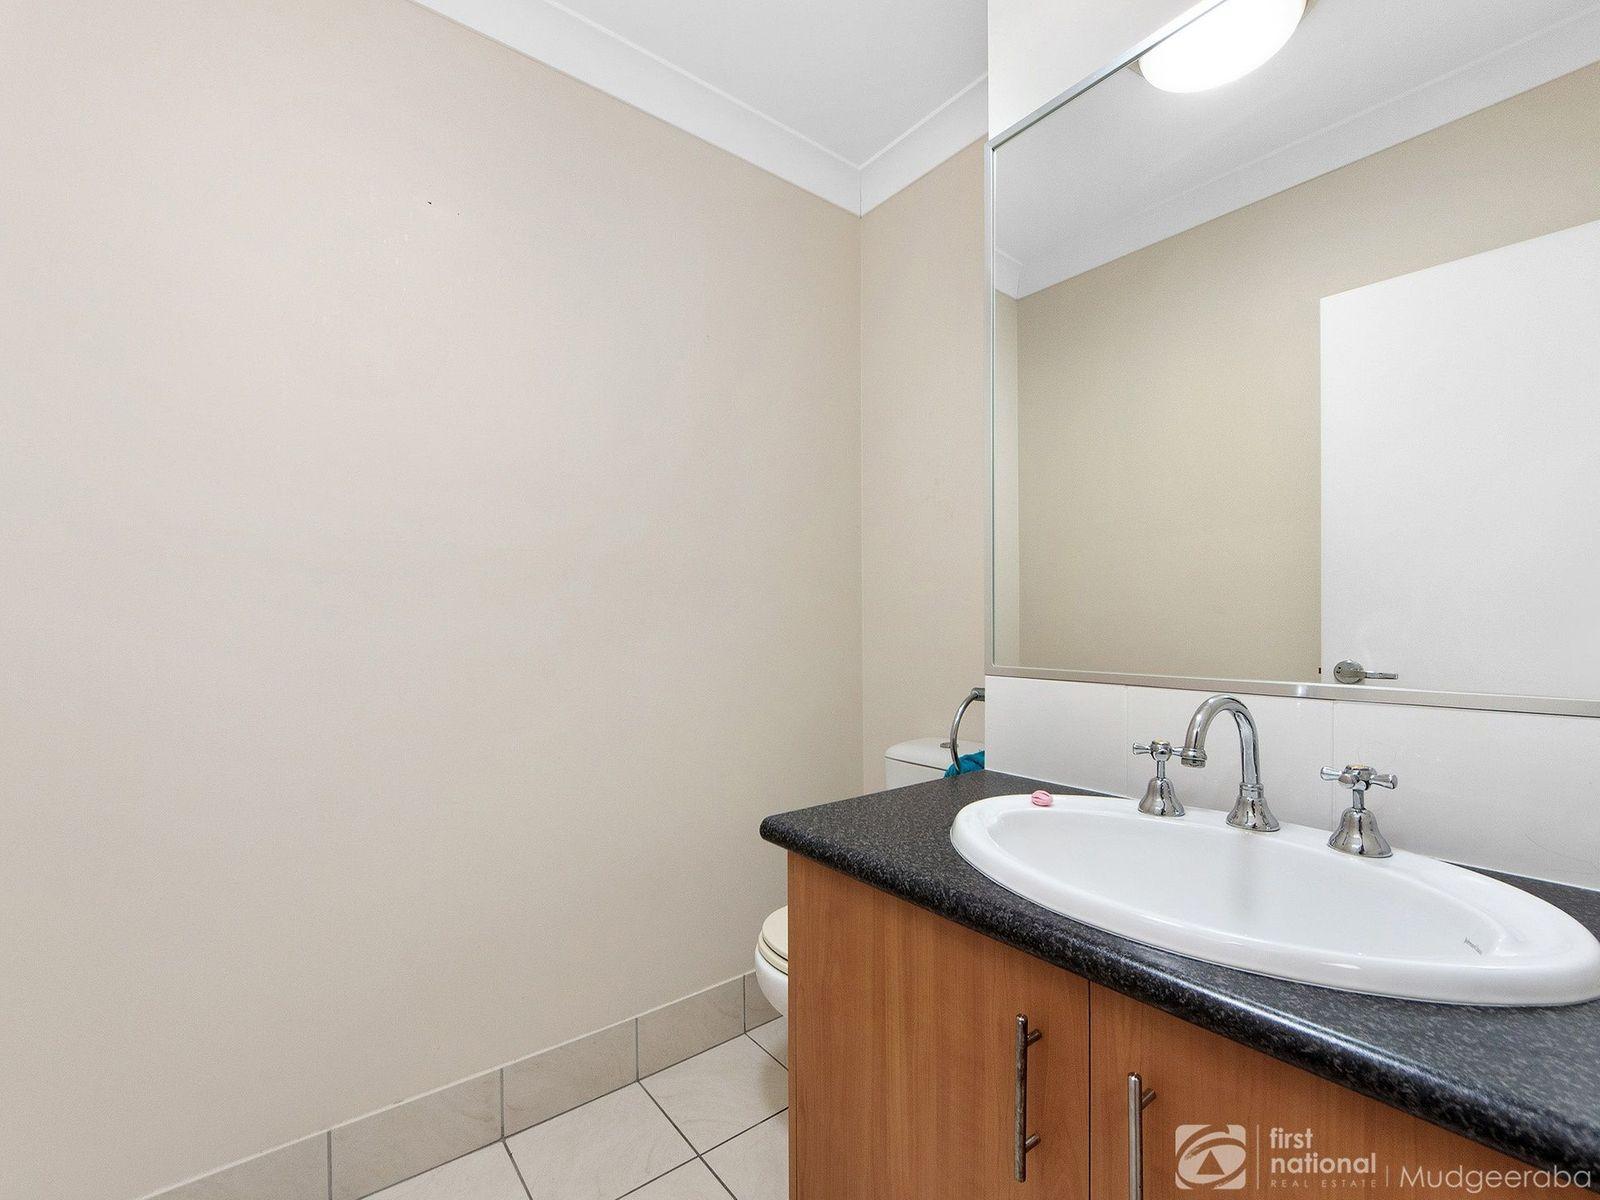 3/23 Robert Street, Mudgeeraba, QLD 4213